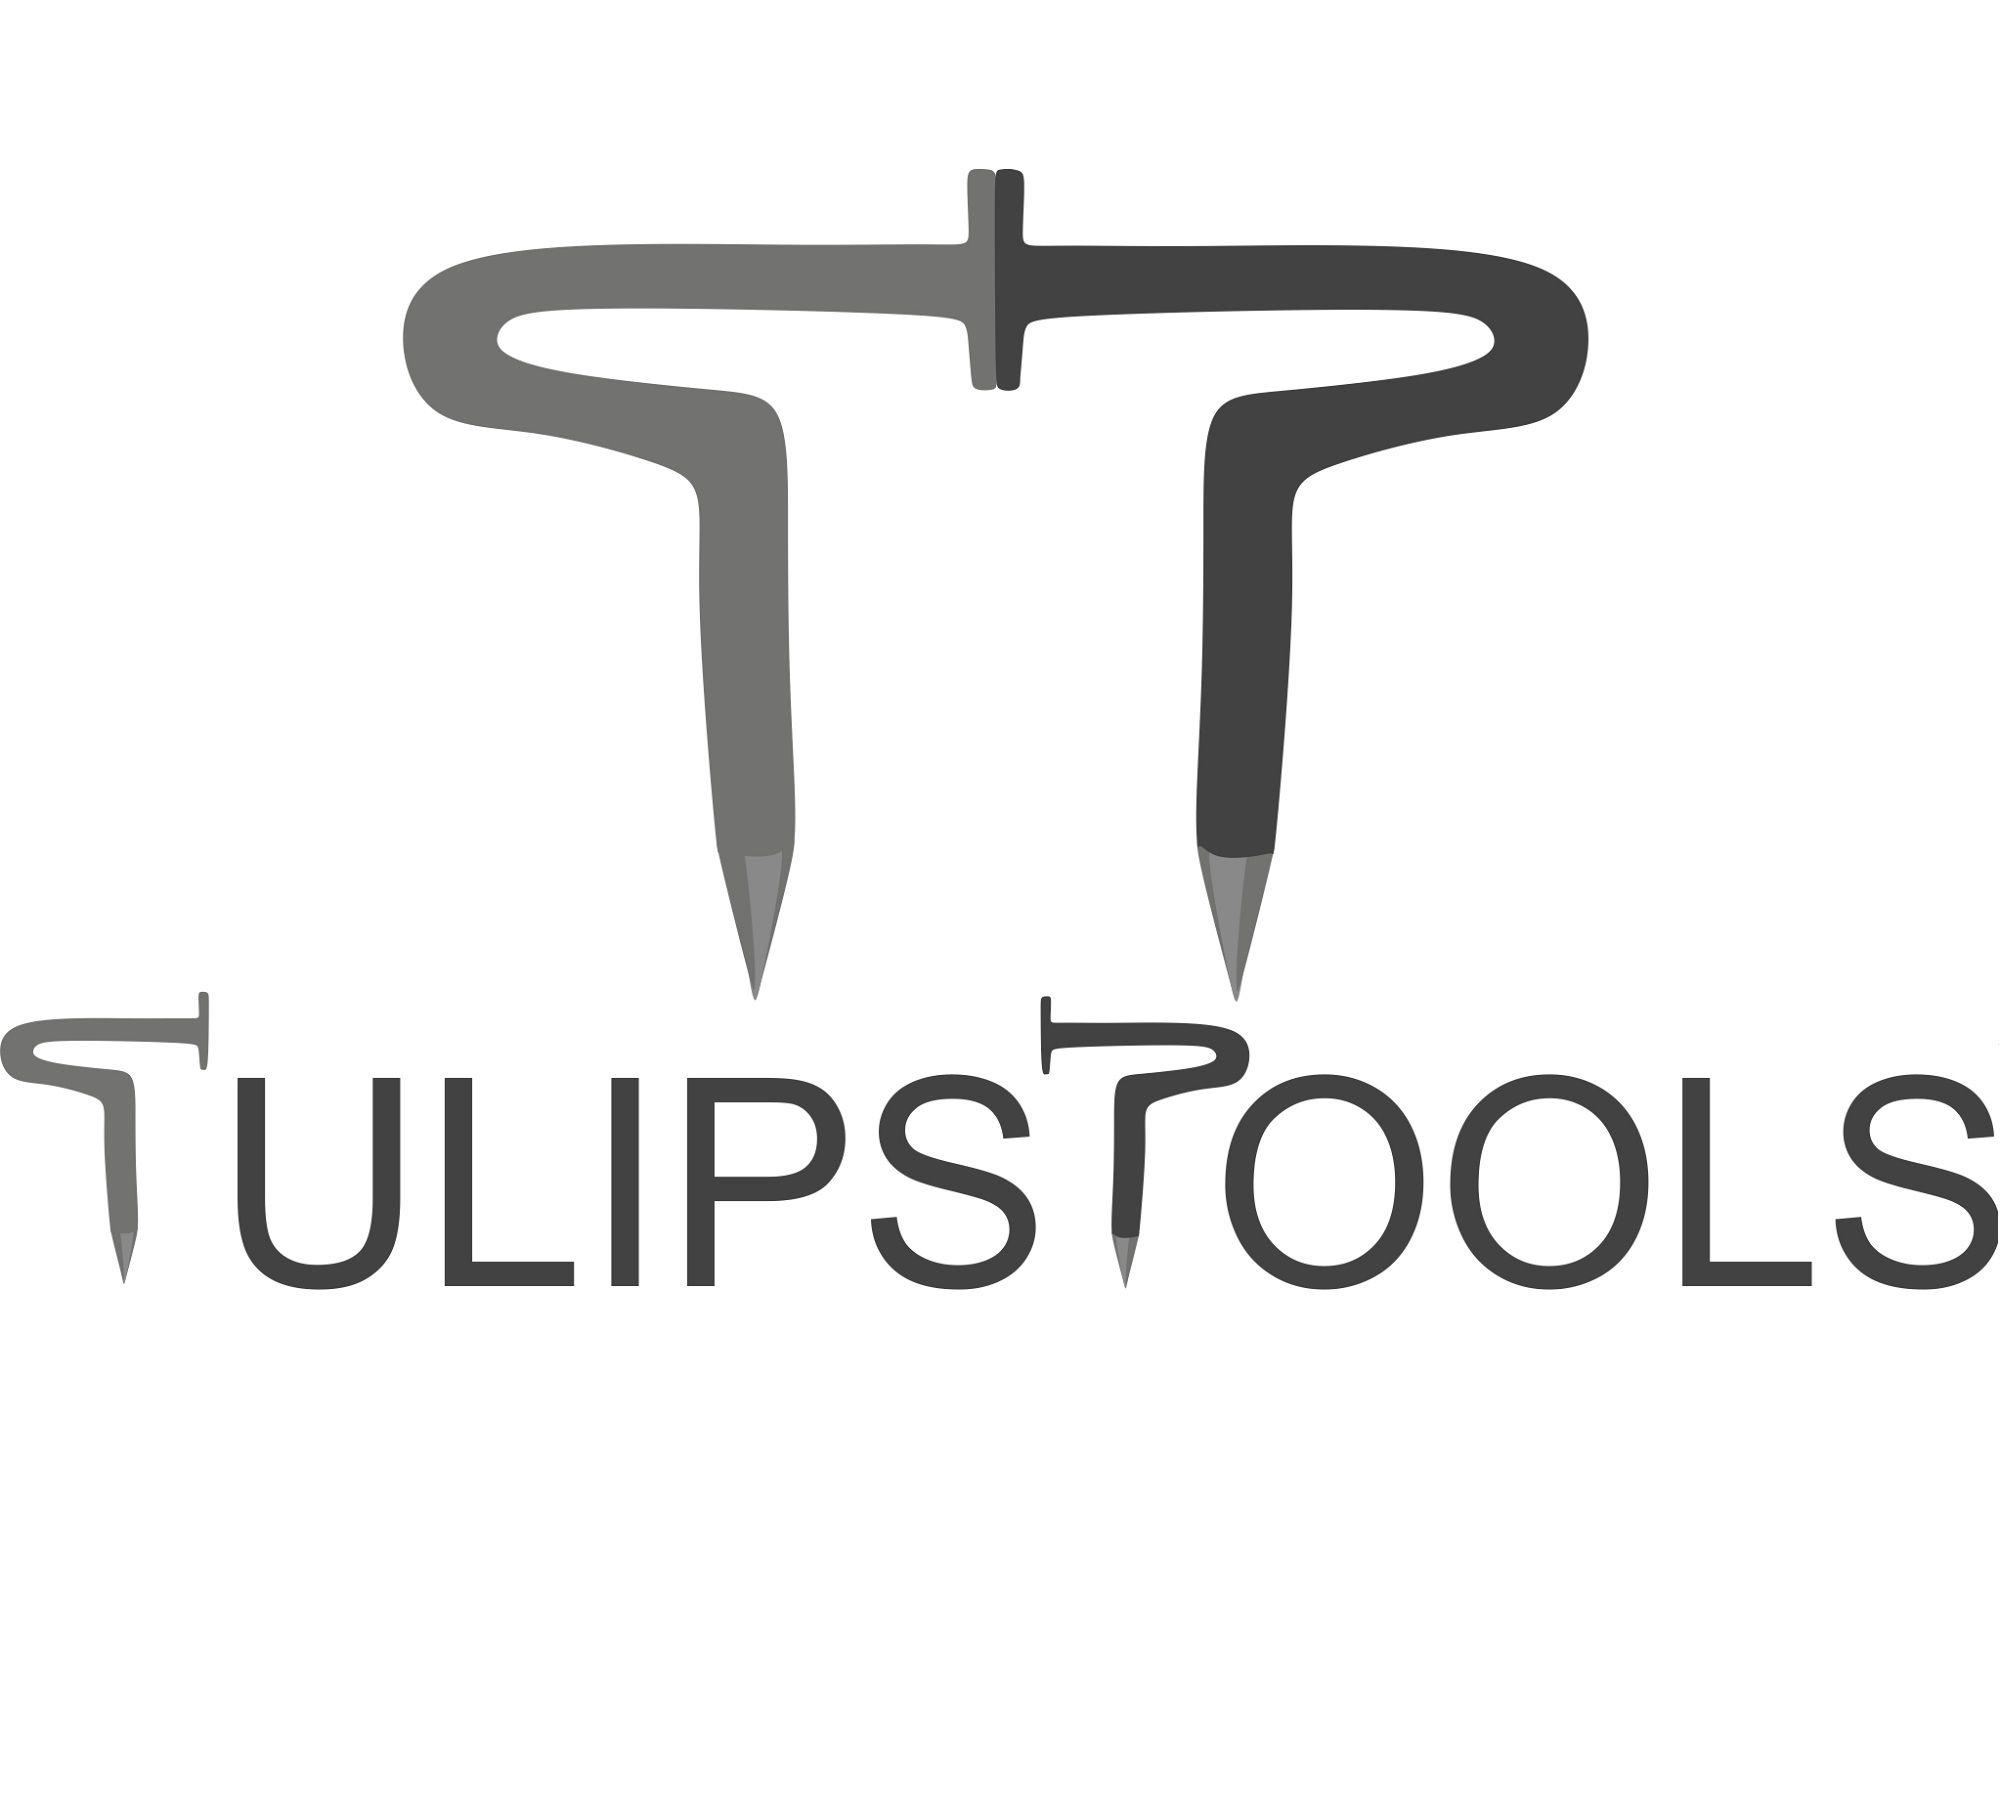 Tulips - дизайнер pumbakot